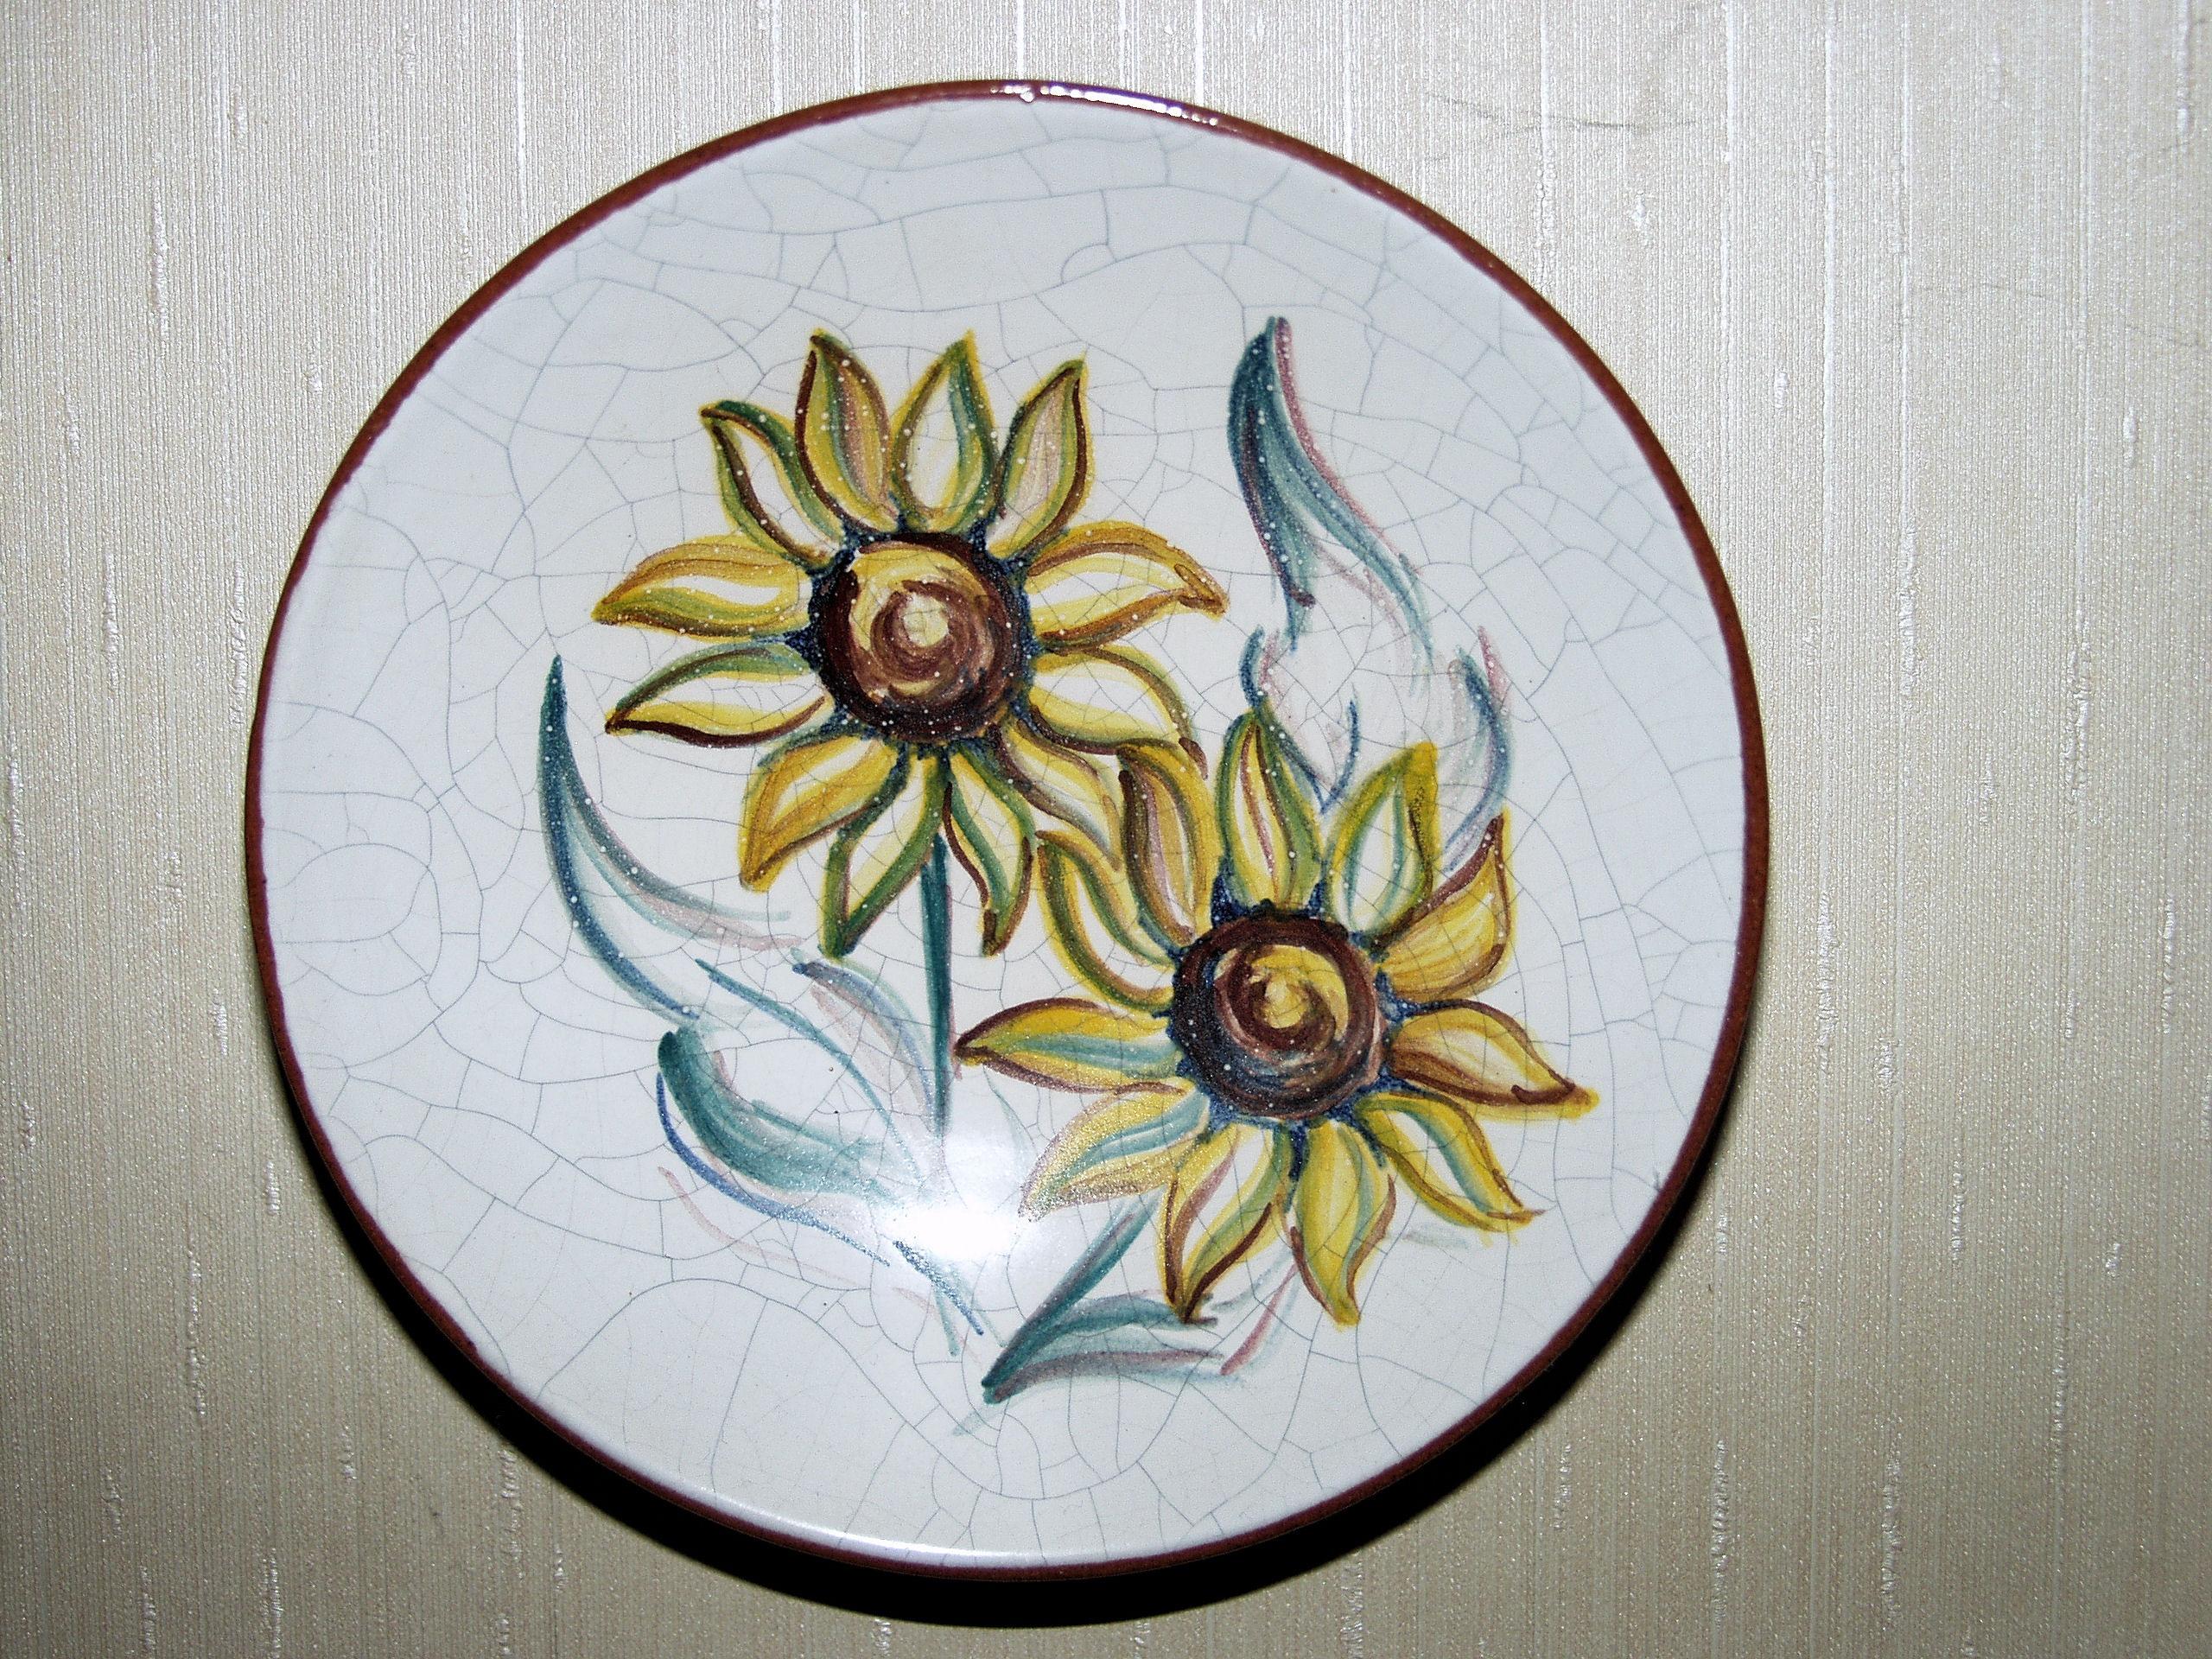 Gambar Daun Bunga Kaca Dekorasi Keramik Piring Warna